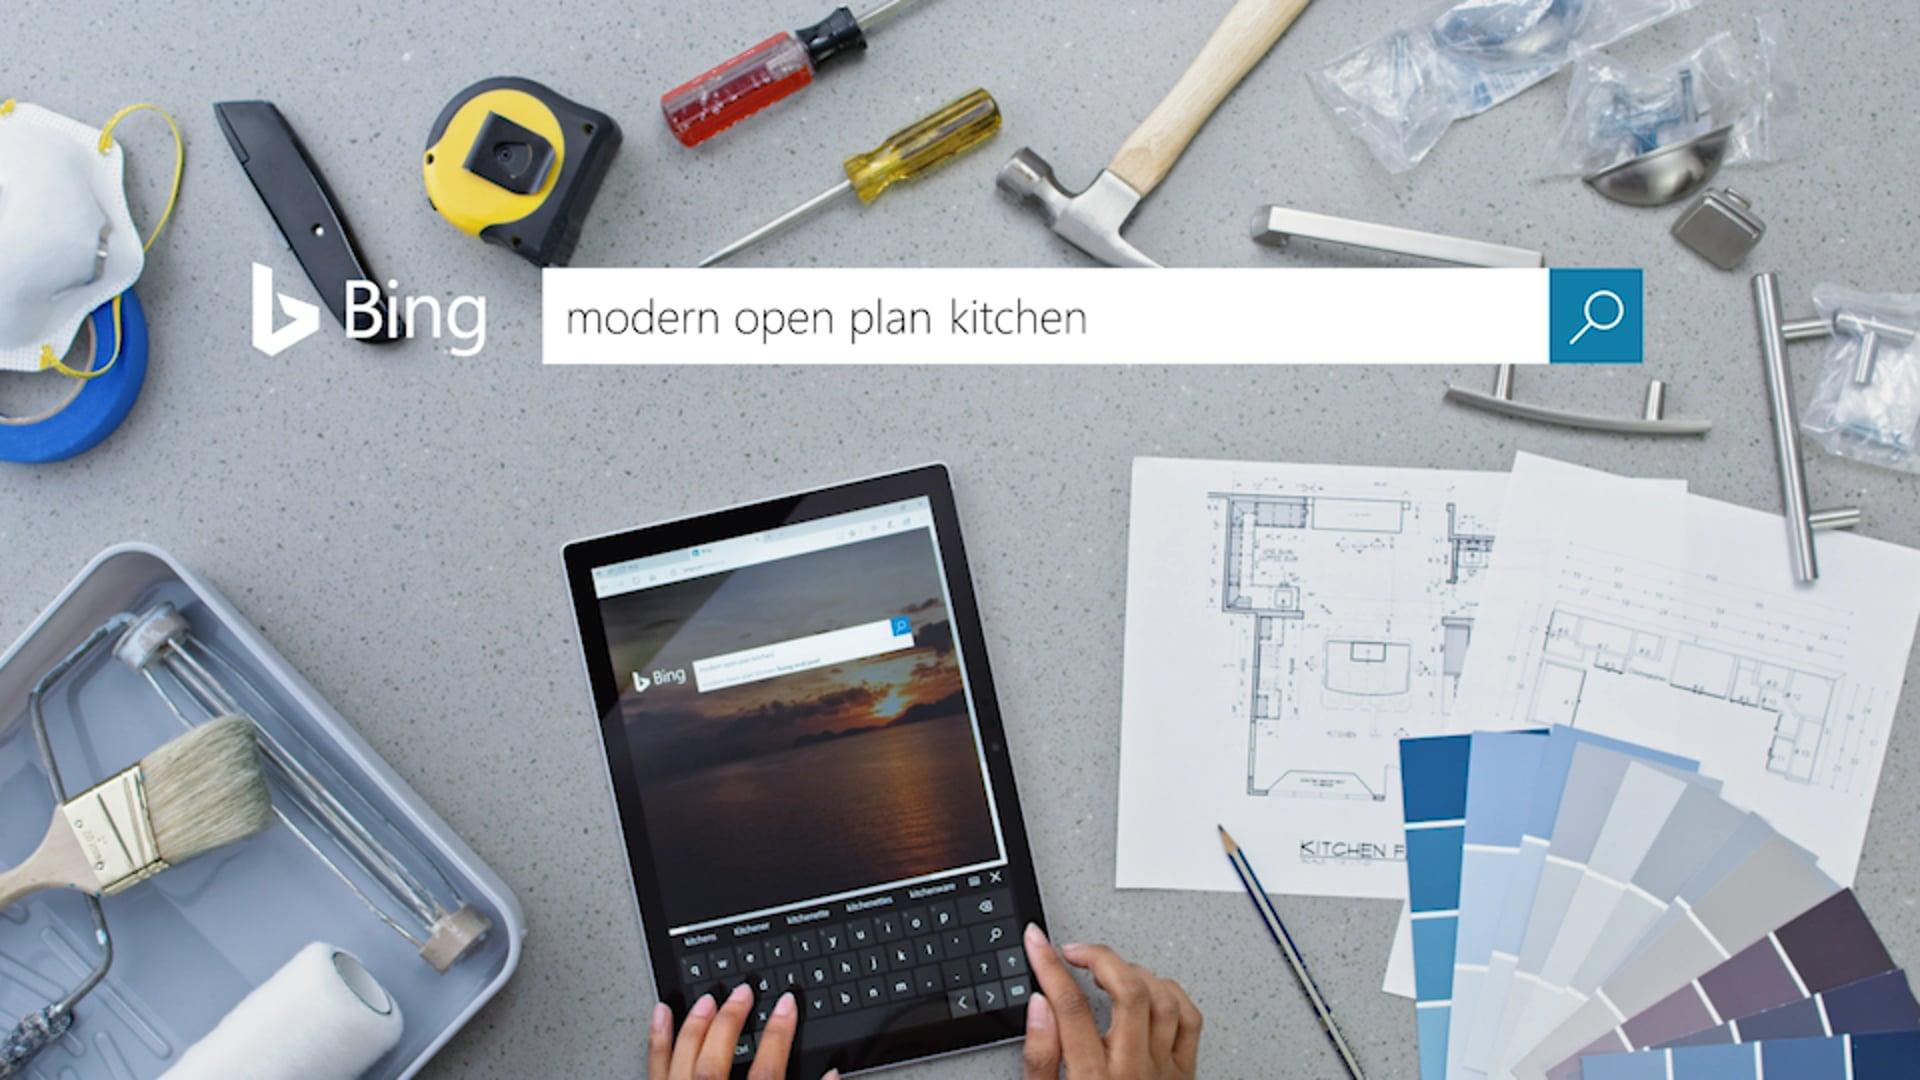 Microsoft Bing - Intelligent Search - Kitchen